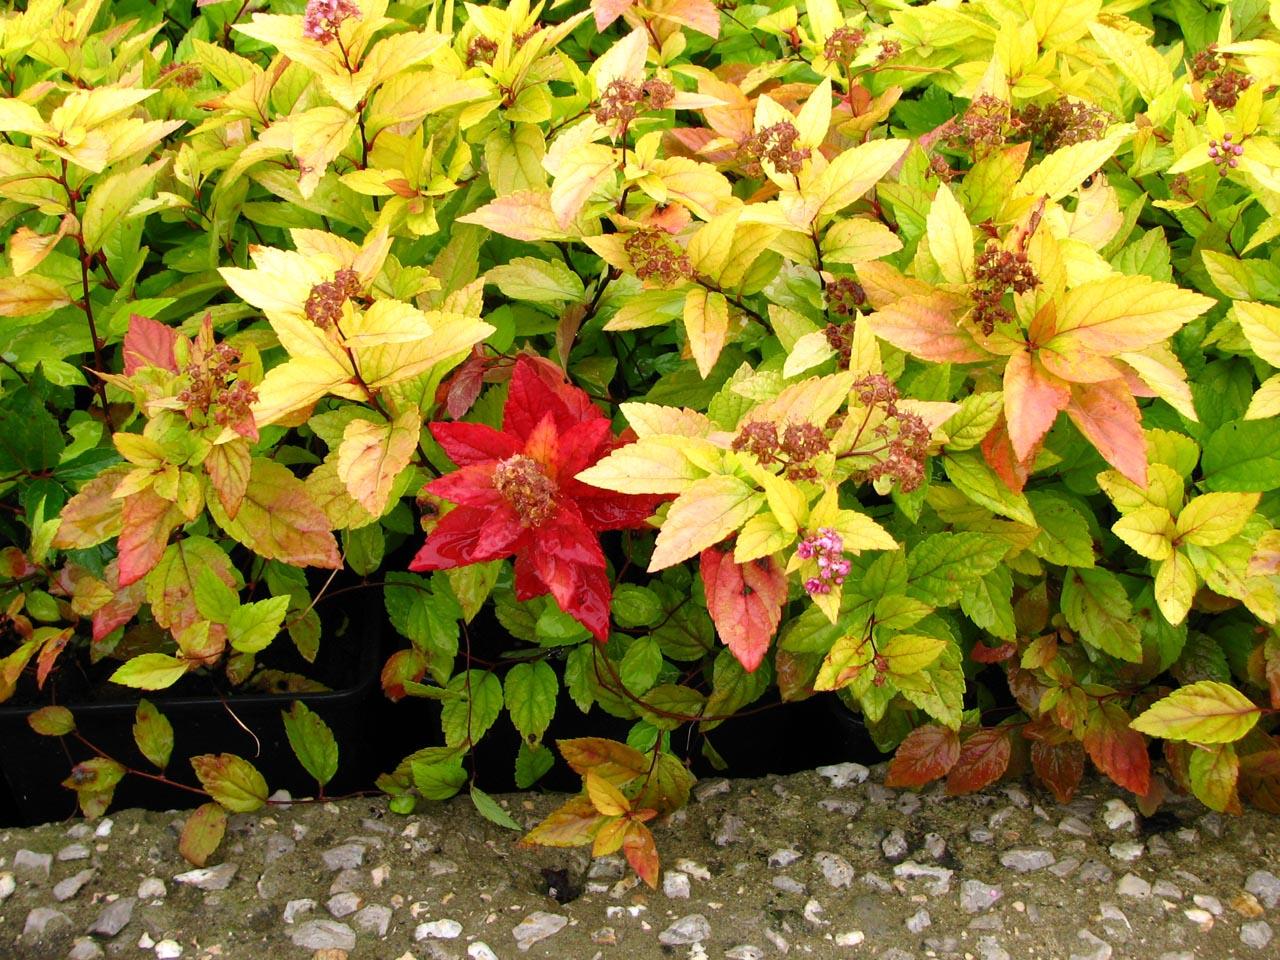 Spiraea japonica 'Gold Mound'- arany levelű, kerti gyöngyvessző